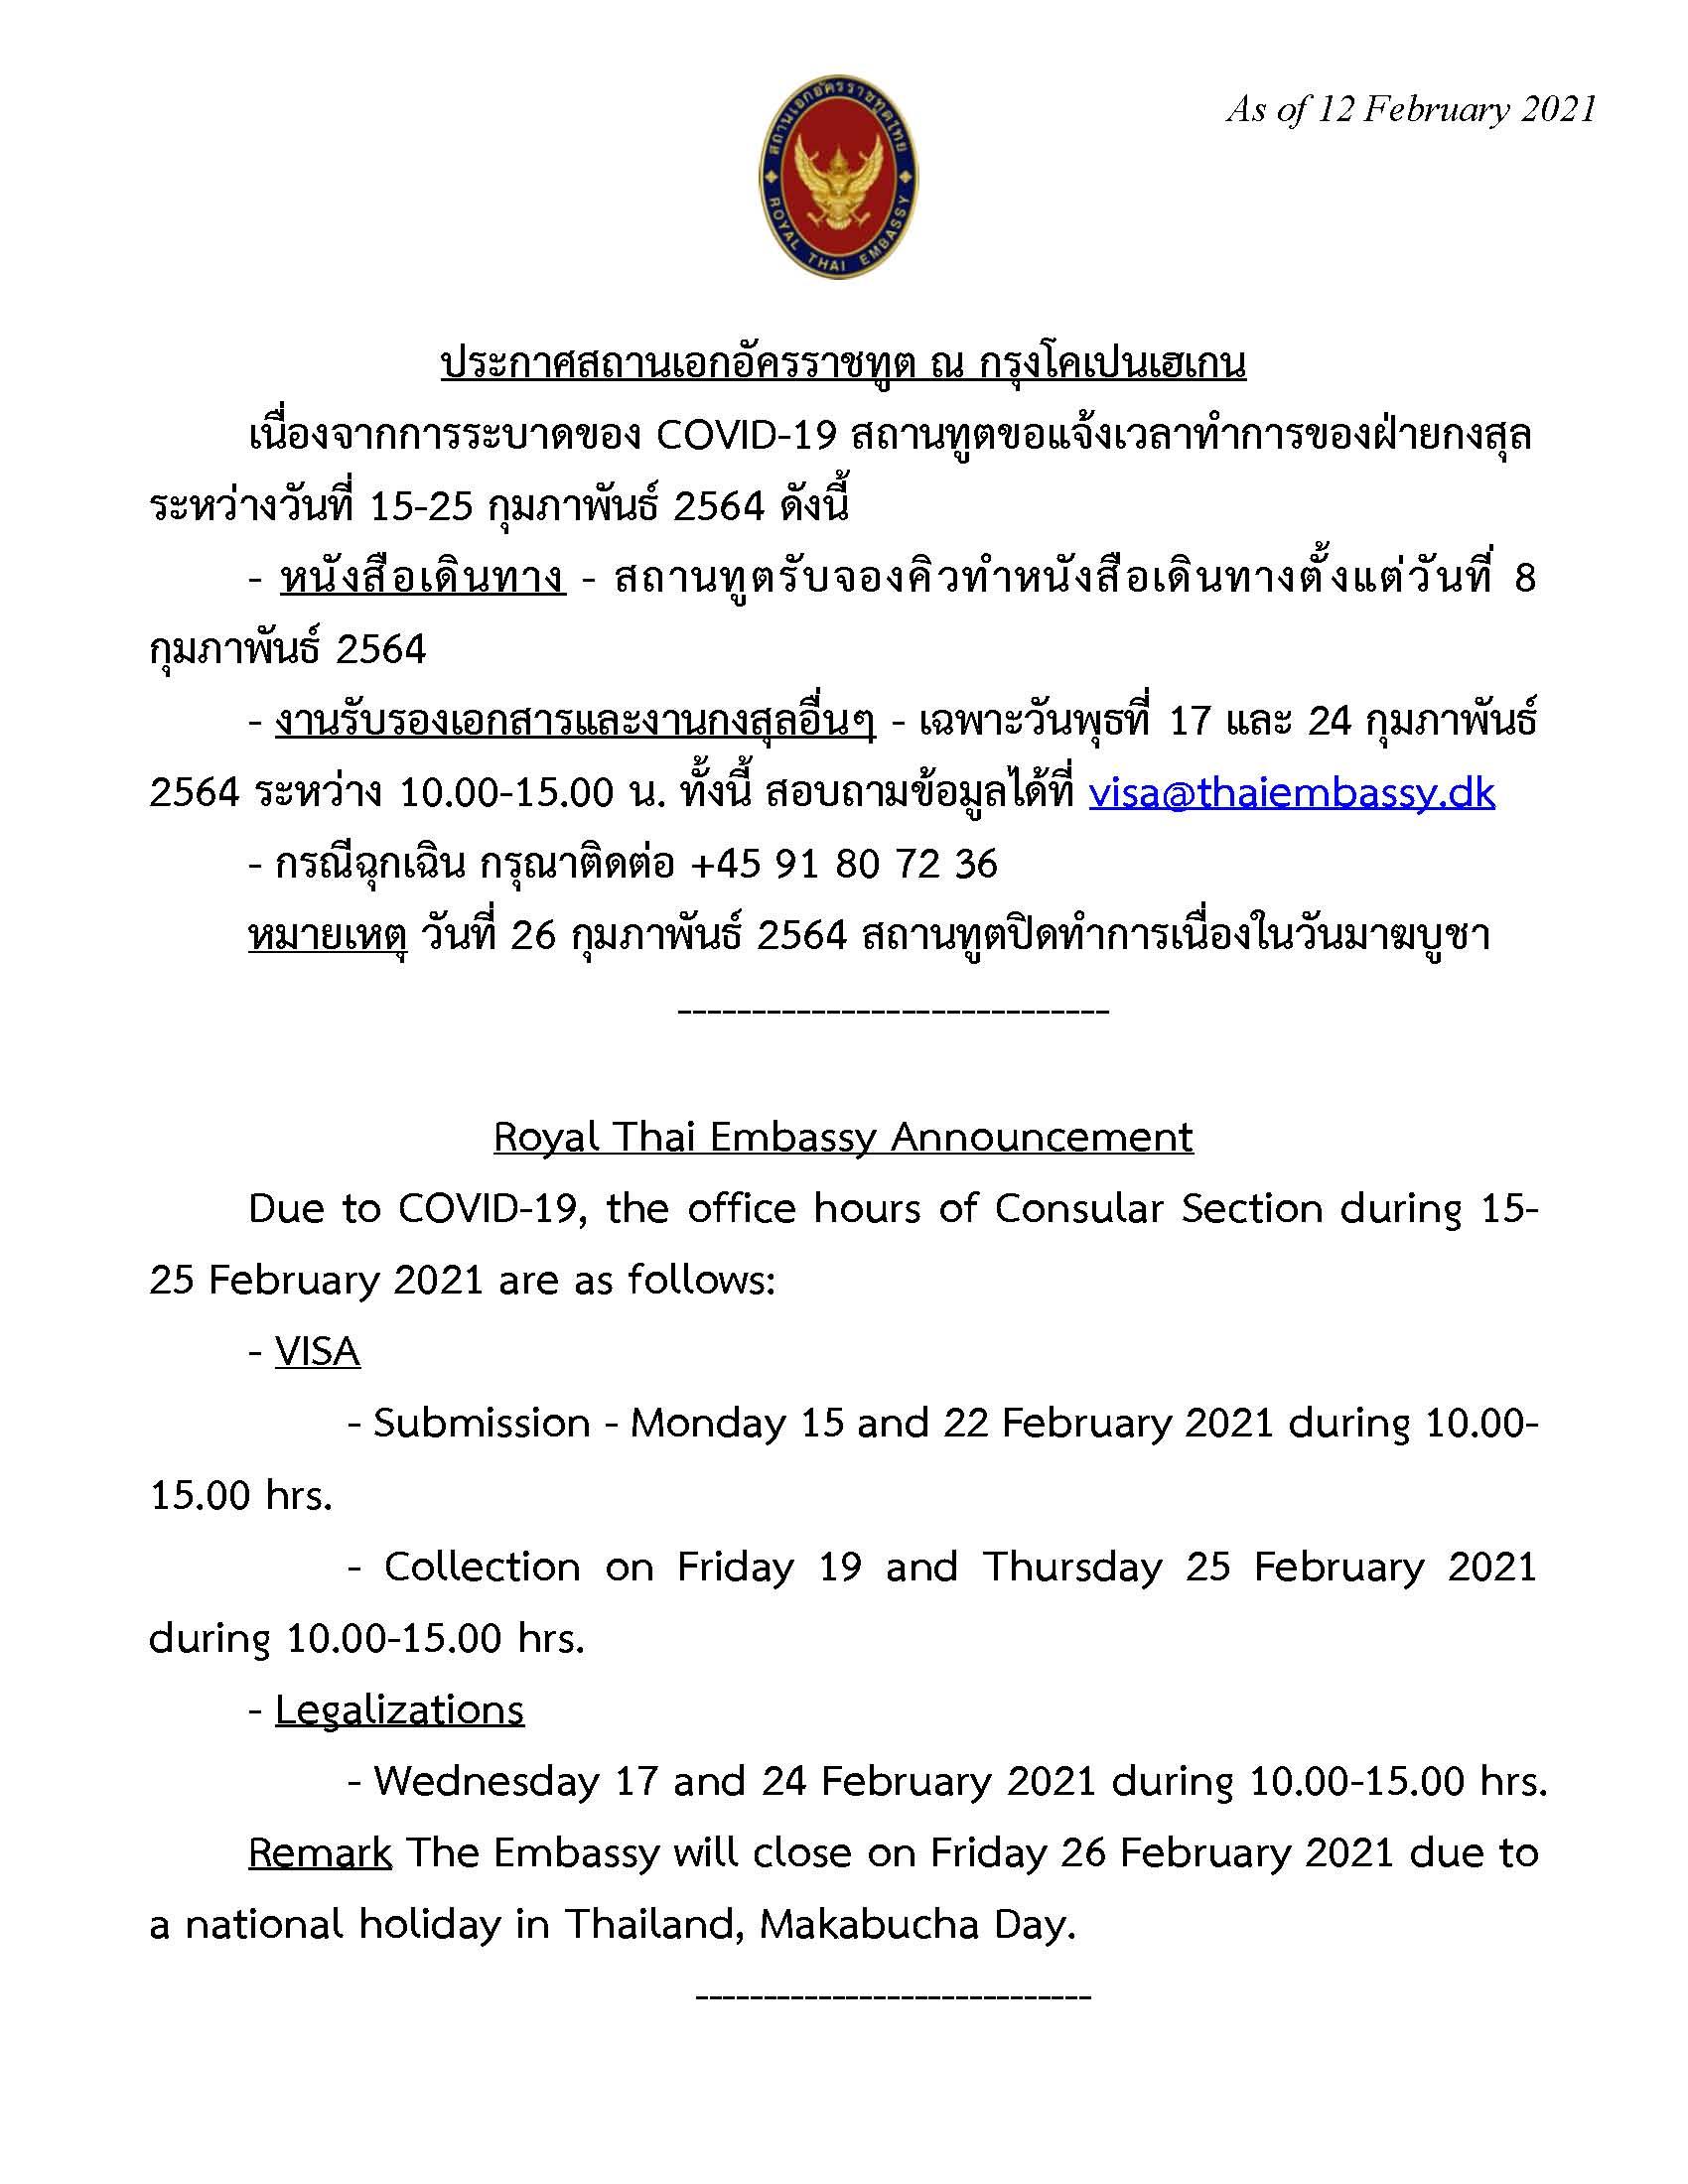 RTE_Annoucement_COVID-Thai_12_FEB_2021